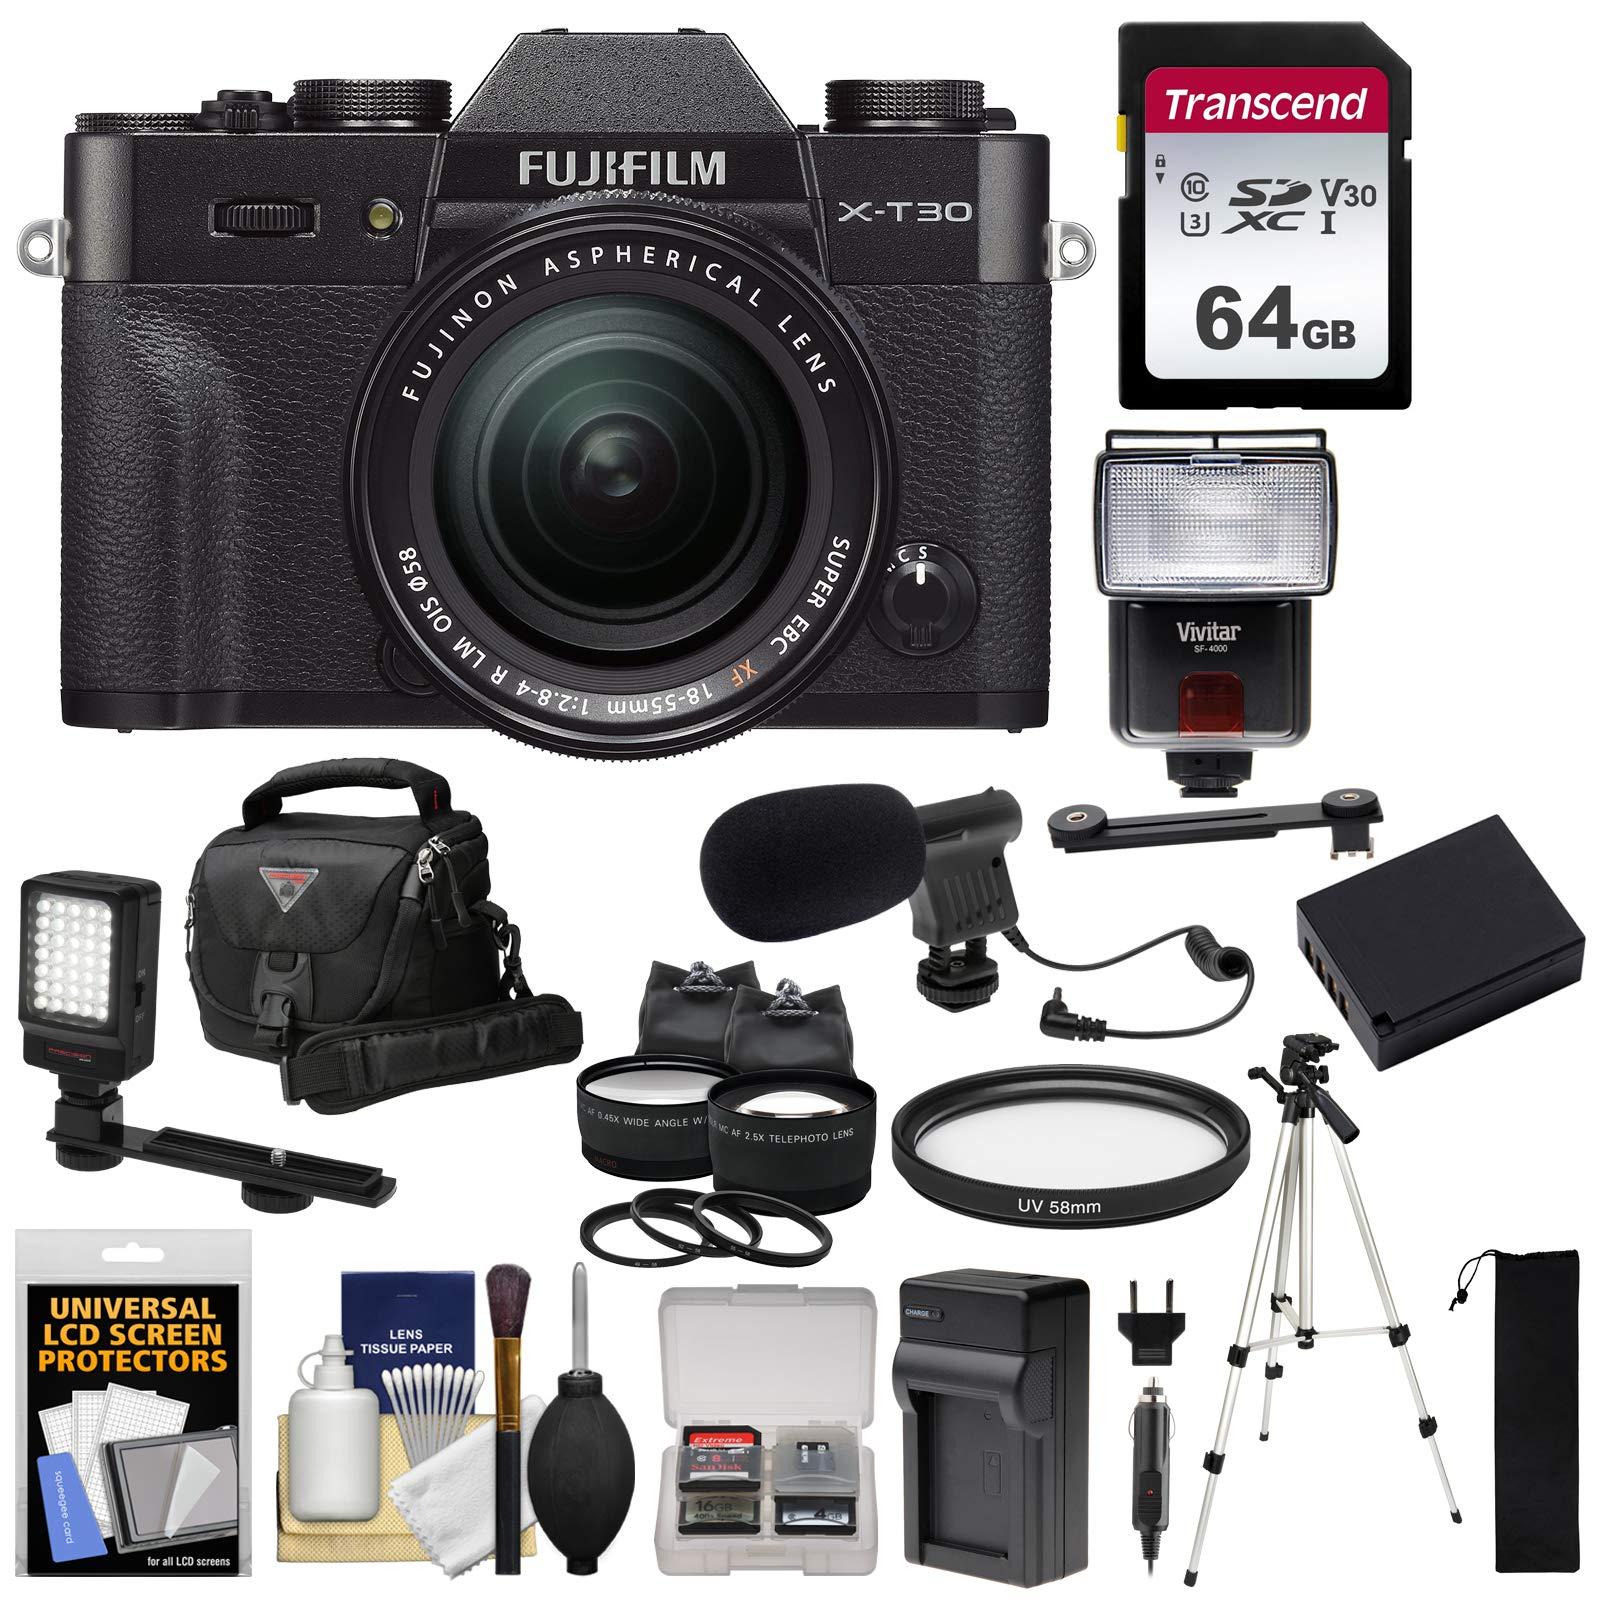 Fujifilm X-T30 Wi-Fi Digital Camera & 18-55mm XF Lens (Black) + 64GB Card + Battery + Charger + Mic + LED Light + Tripod + Flash + Case + 2 Lens Kit